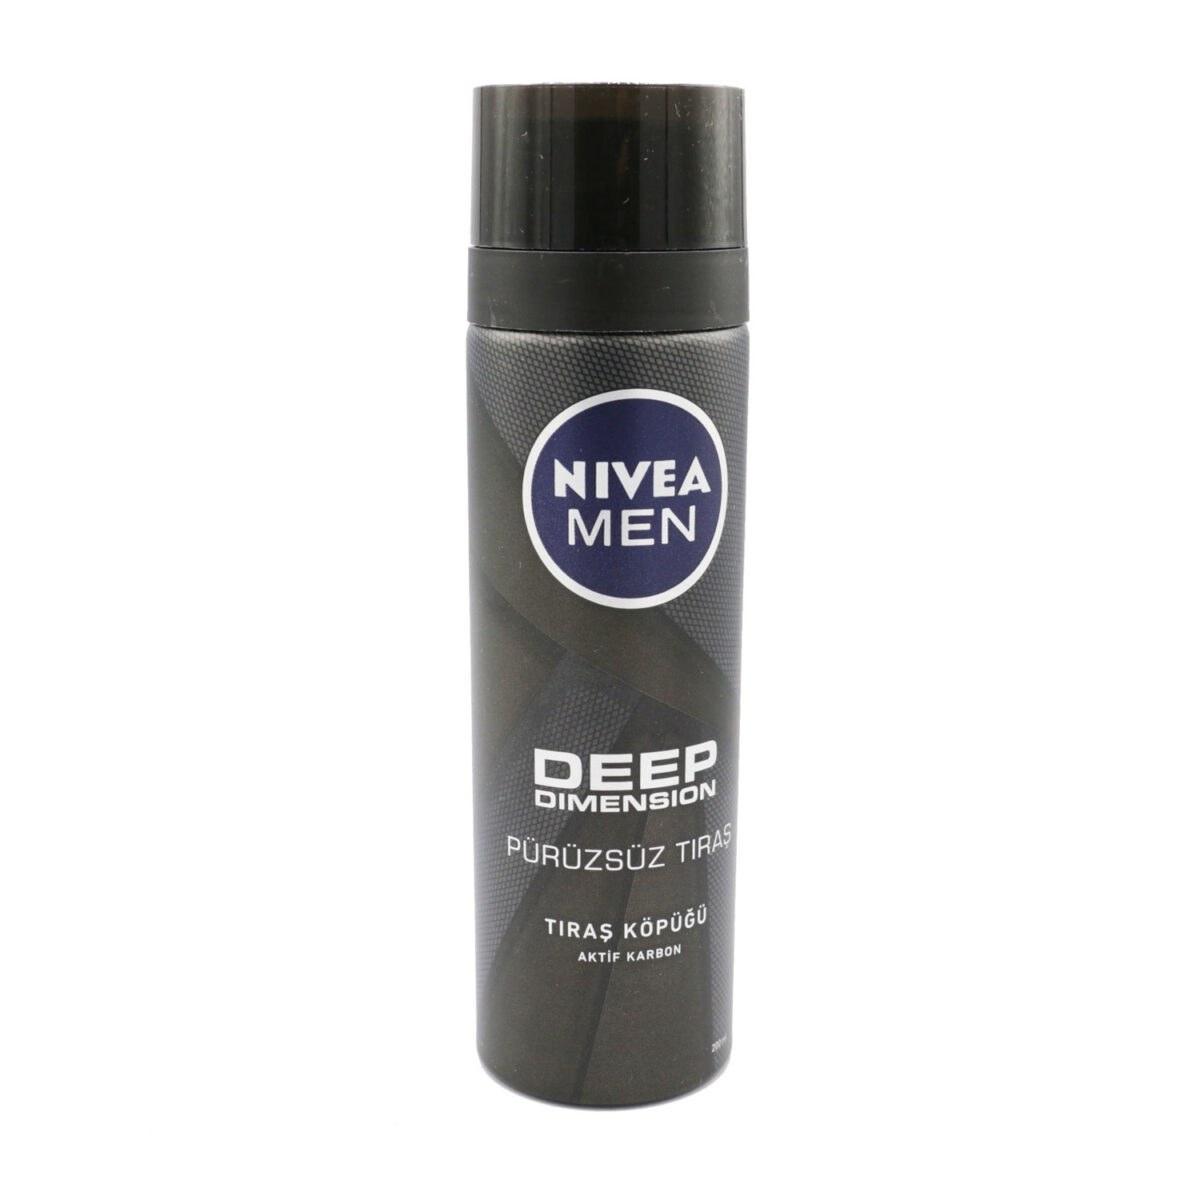 تصویر ژل اصلاح نیوآ مدل Deep با حجم 200 میلی لیتر Nivea Men Deep Clean Shave 200ml